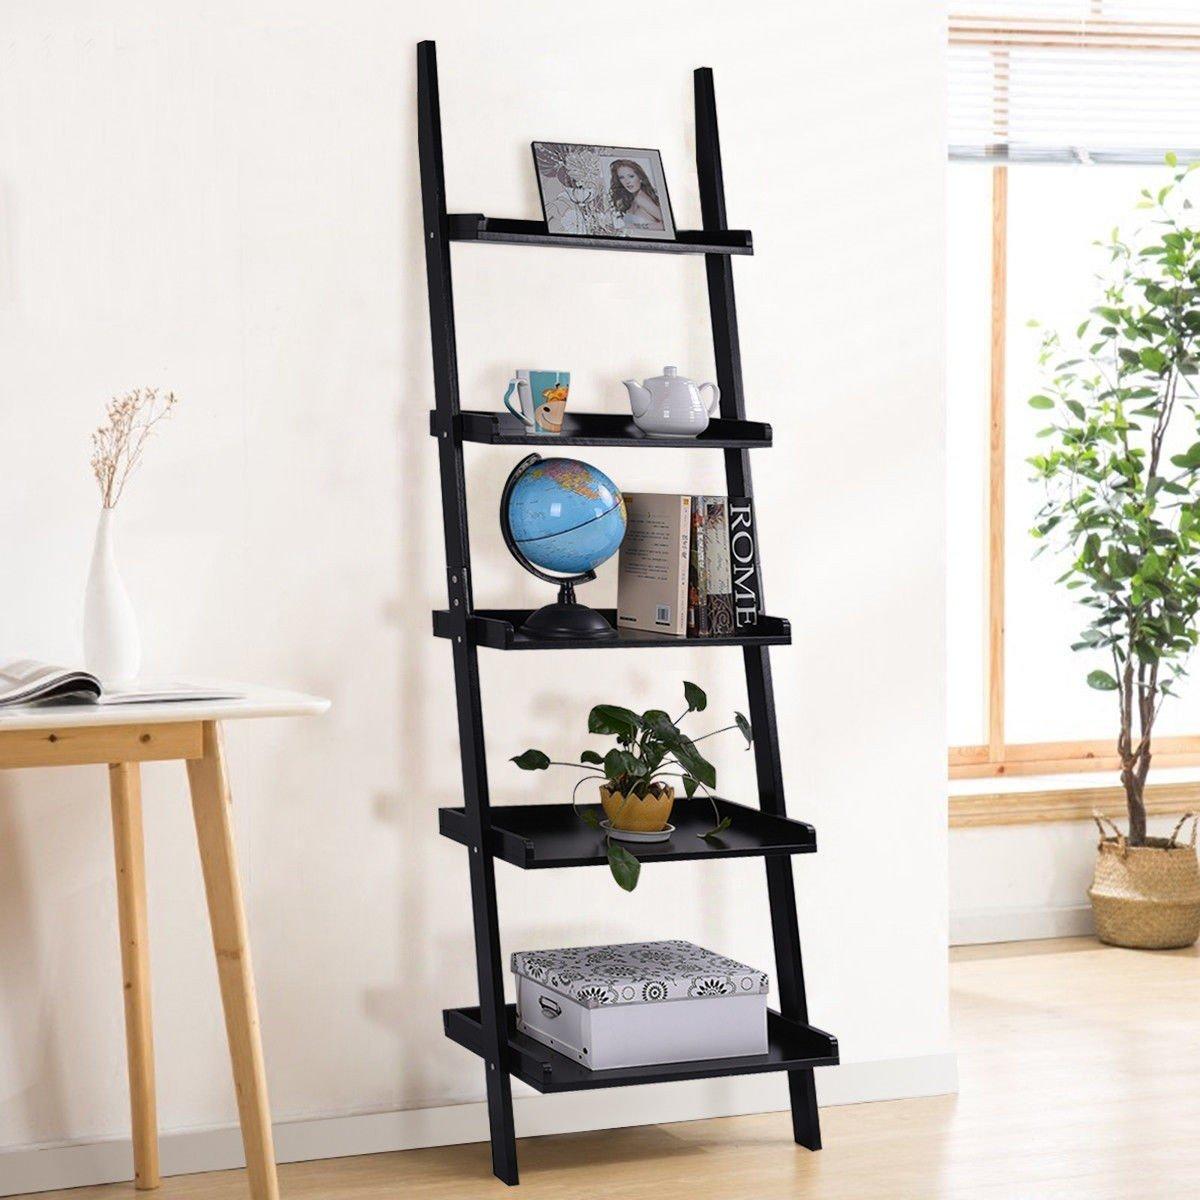 5 Tier Leaning Wall Storage Display Shelf Ladder Shelves Ladder